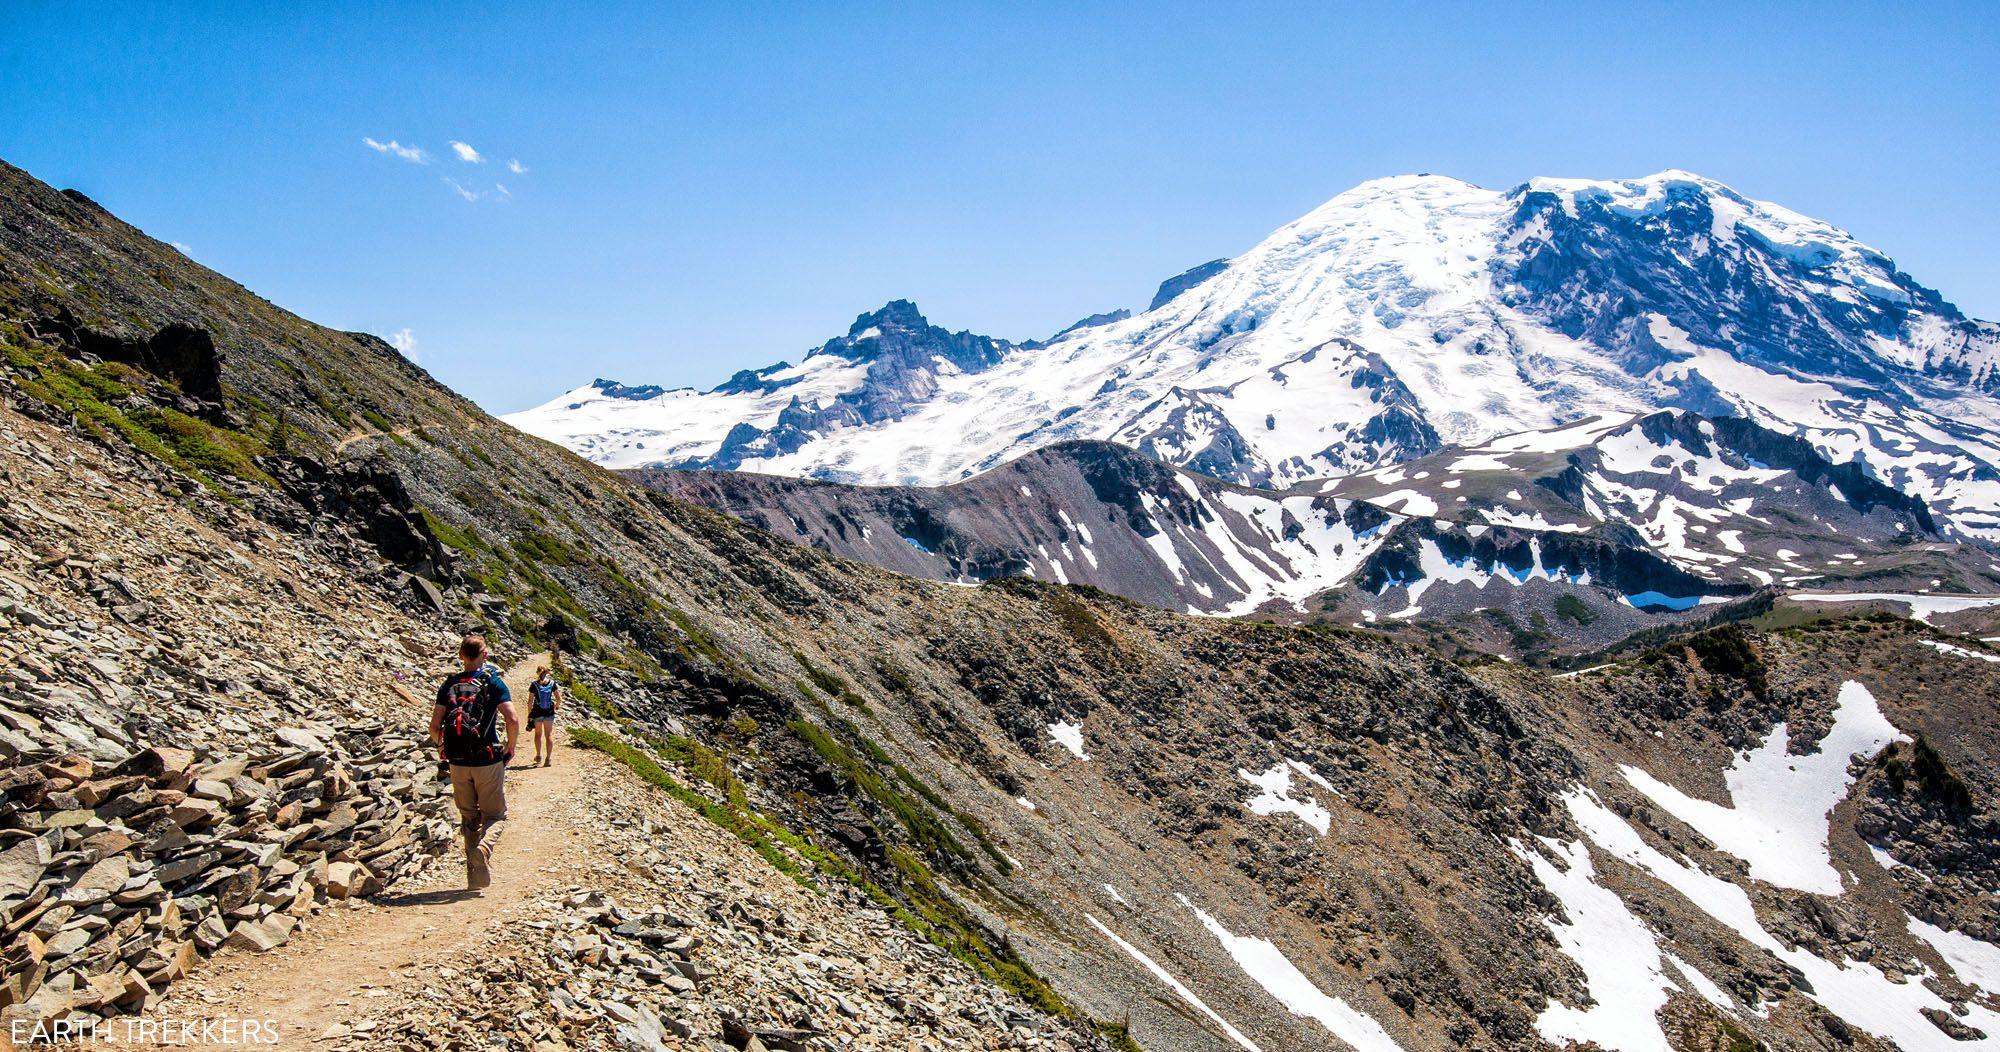 Hike Mount Rainier National Park